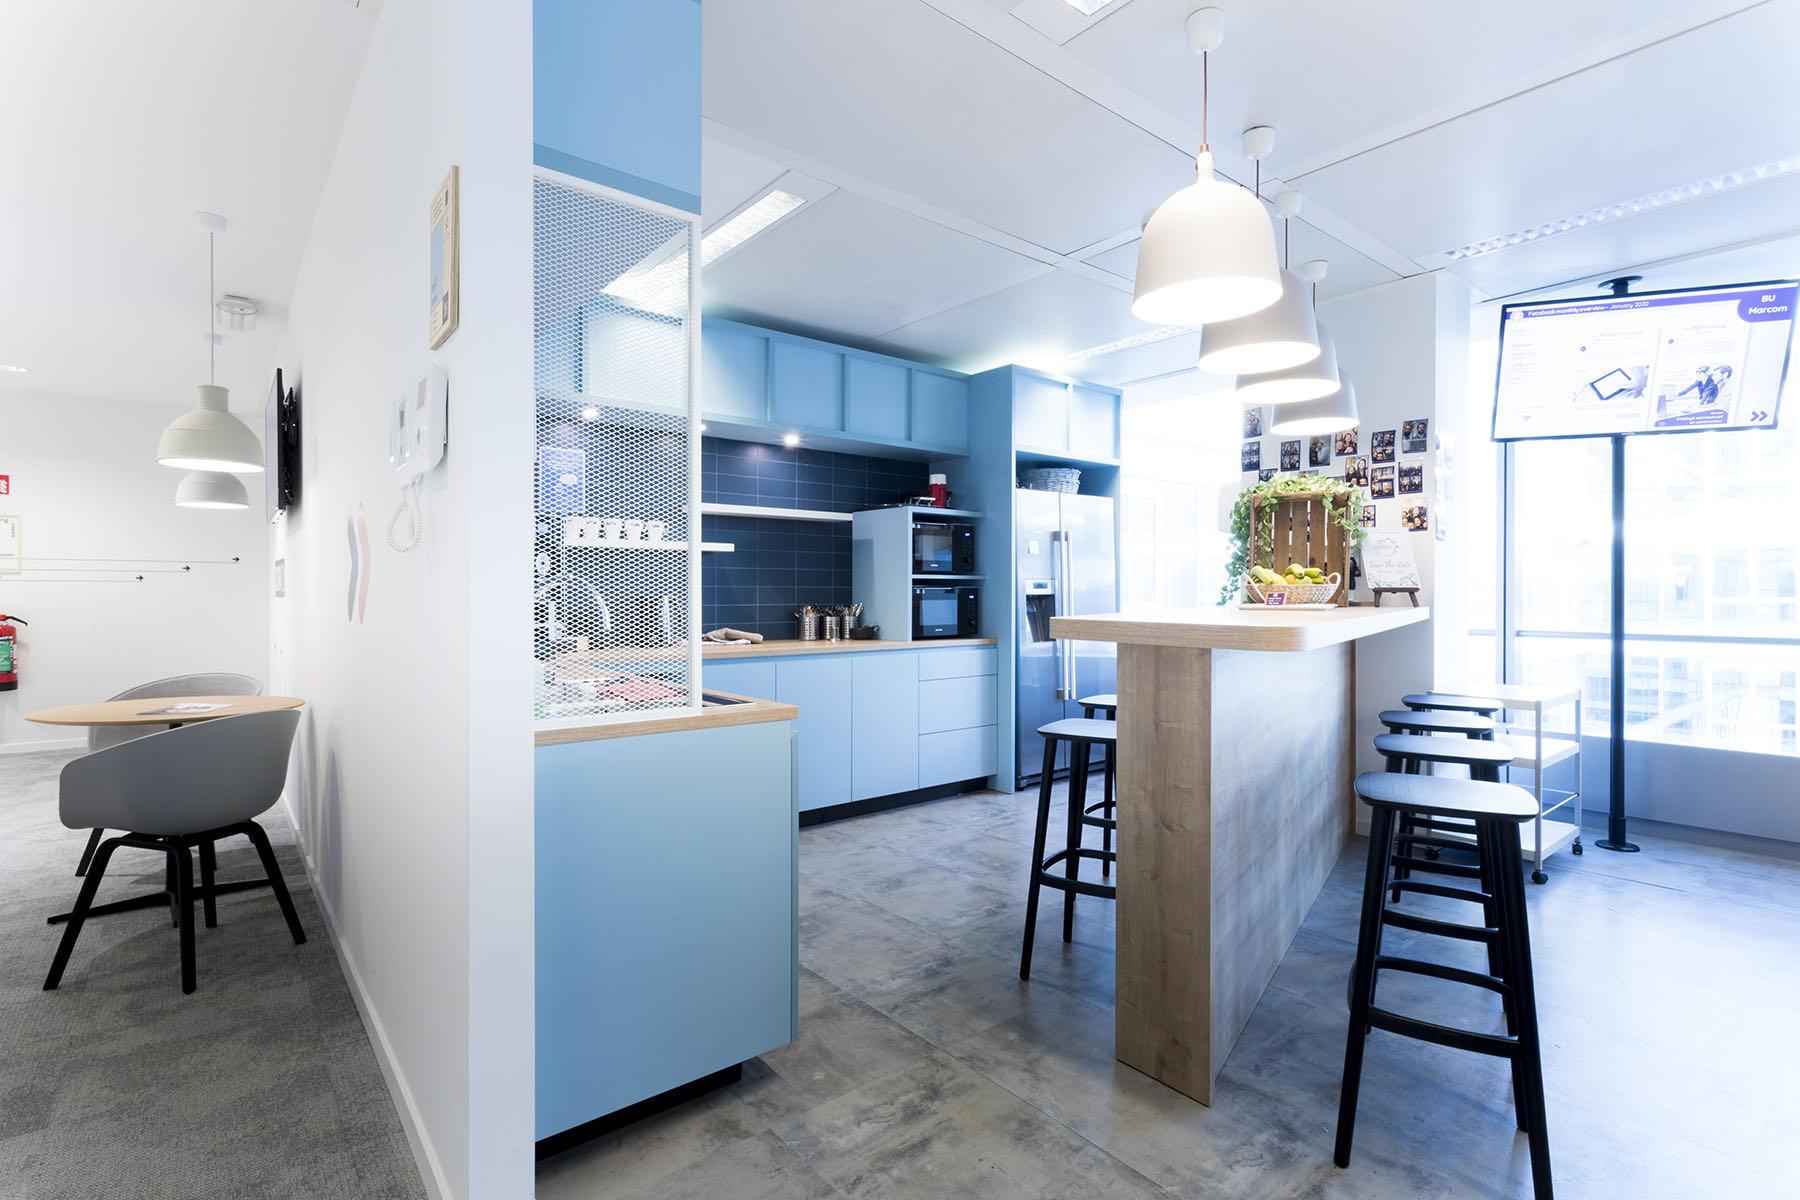 cefora-brussels-office-6